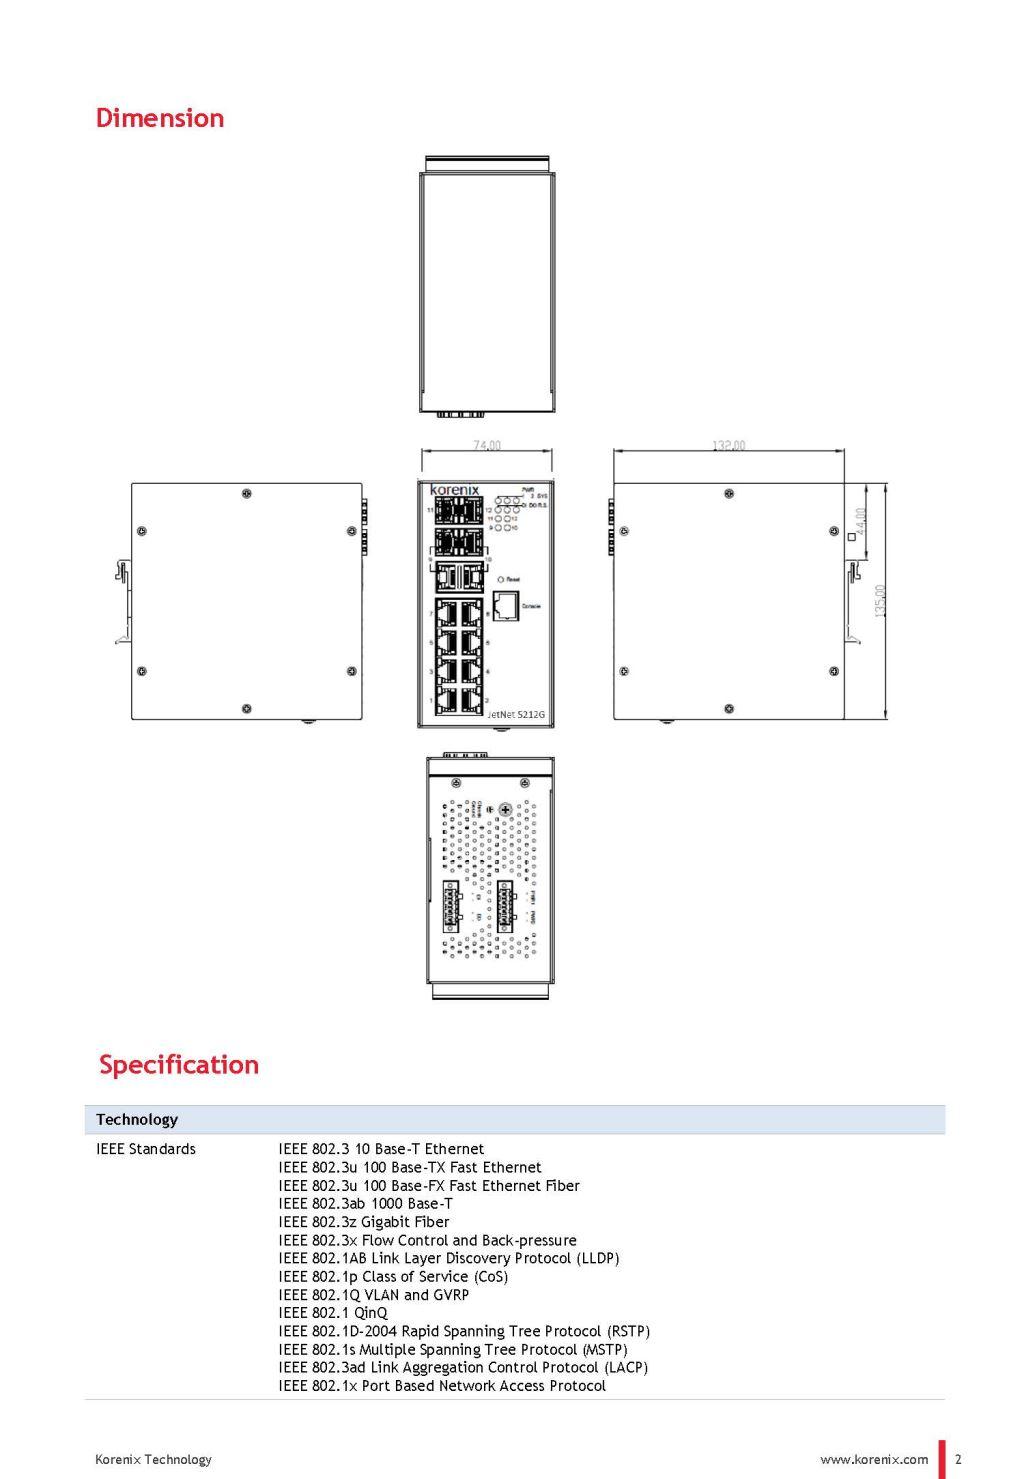 korenix JetNet 5212G-2C2FIndustrial 8G RJ45 + 2G Combo + 2G SFP Managed Ethernet Switch